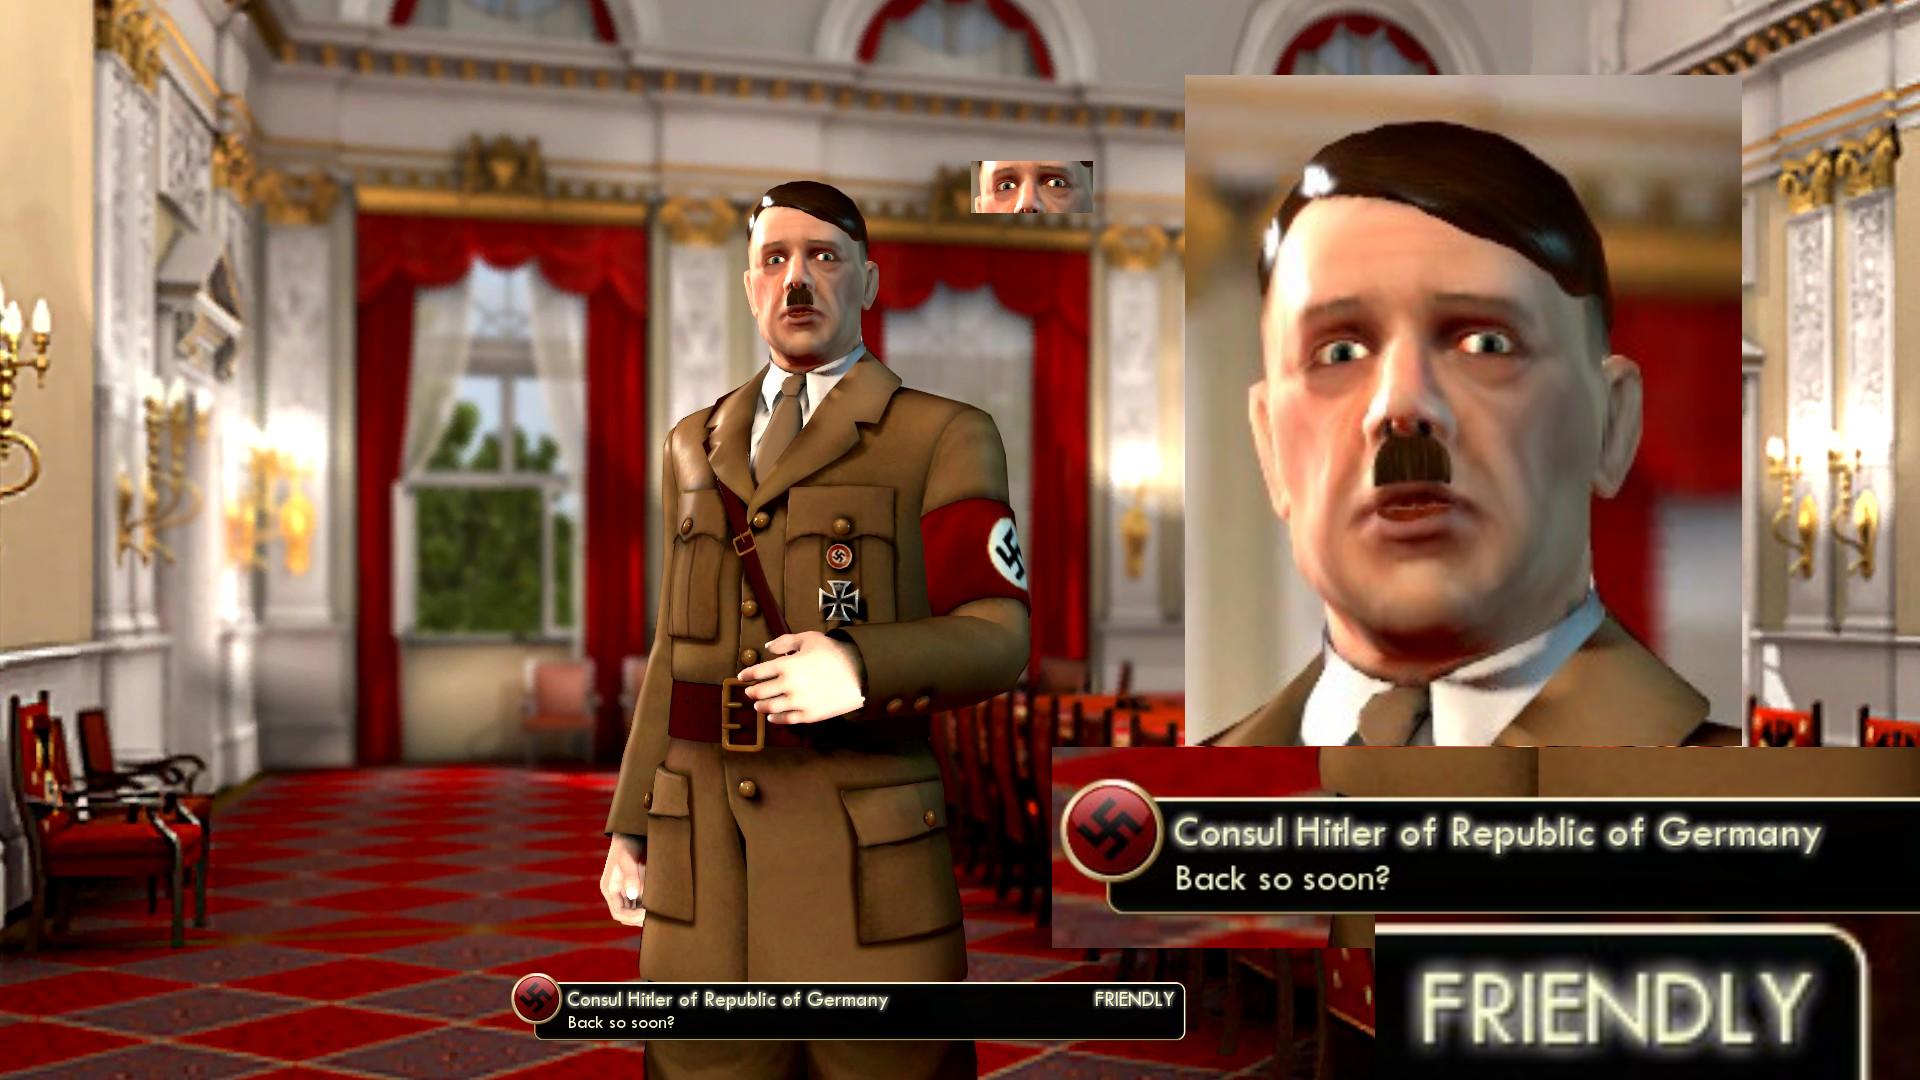 """Friendly"" Hitler is okay | Adolf Hitler | Know Your Meme"